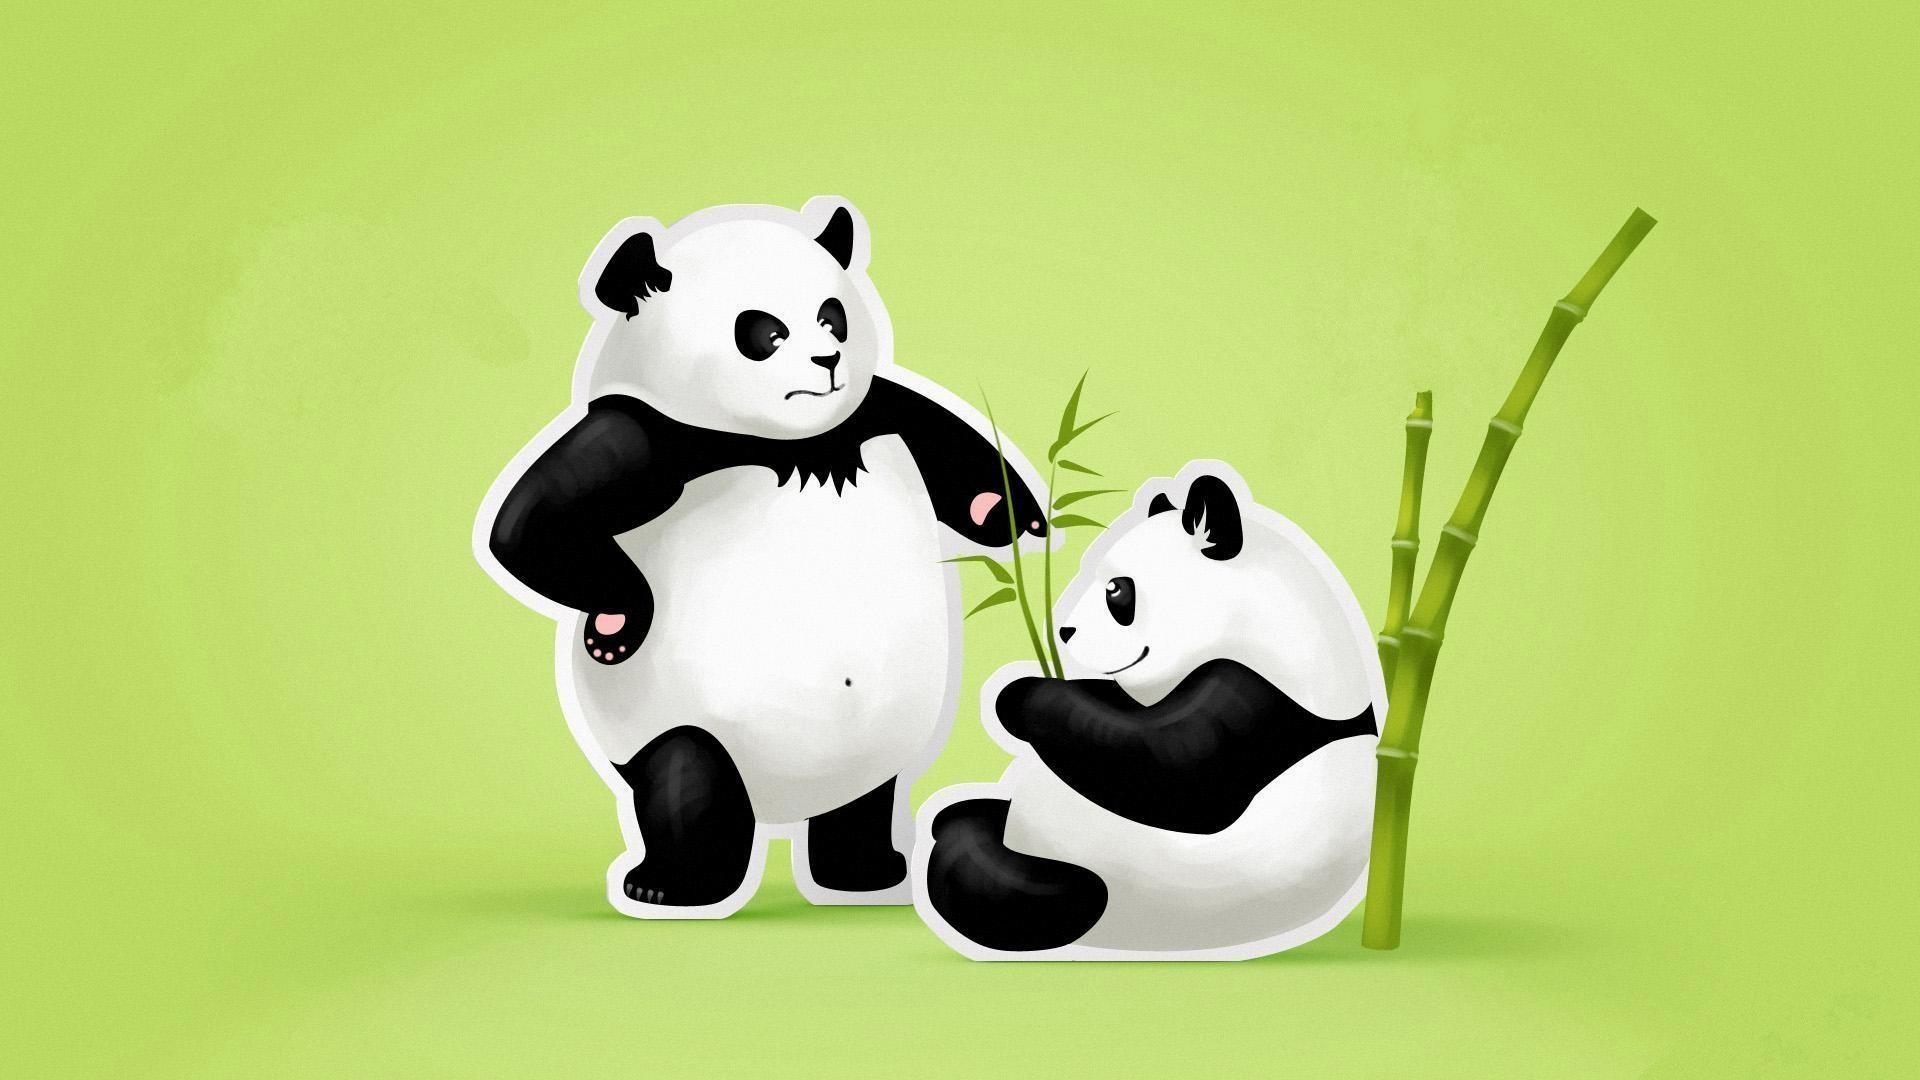 Panda-couple-threat-quarrel-green-black-white-wallpapers-